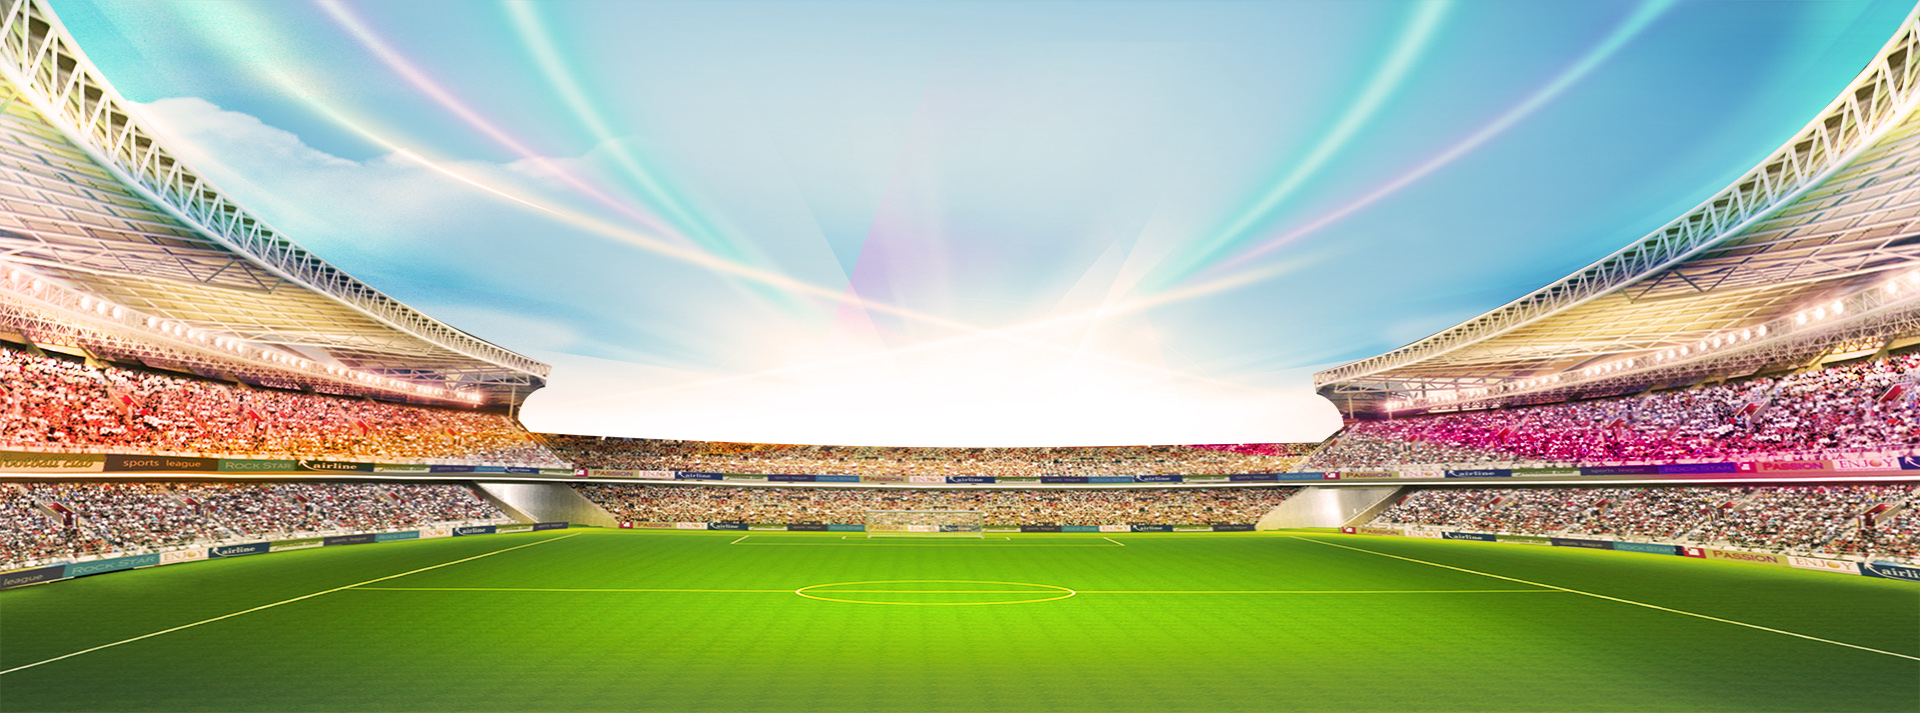 Cricket Vector Background Stock Image: Stadium Banner Background, Court, Stadium, Greenbelt